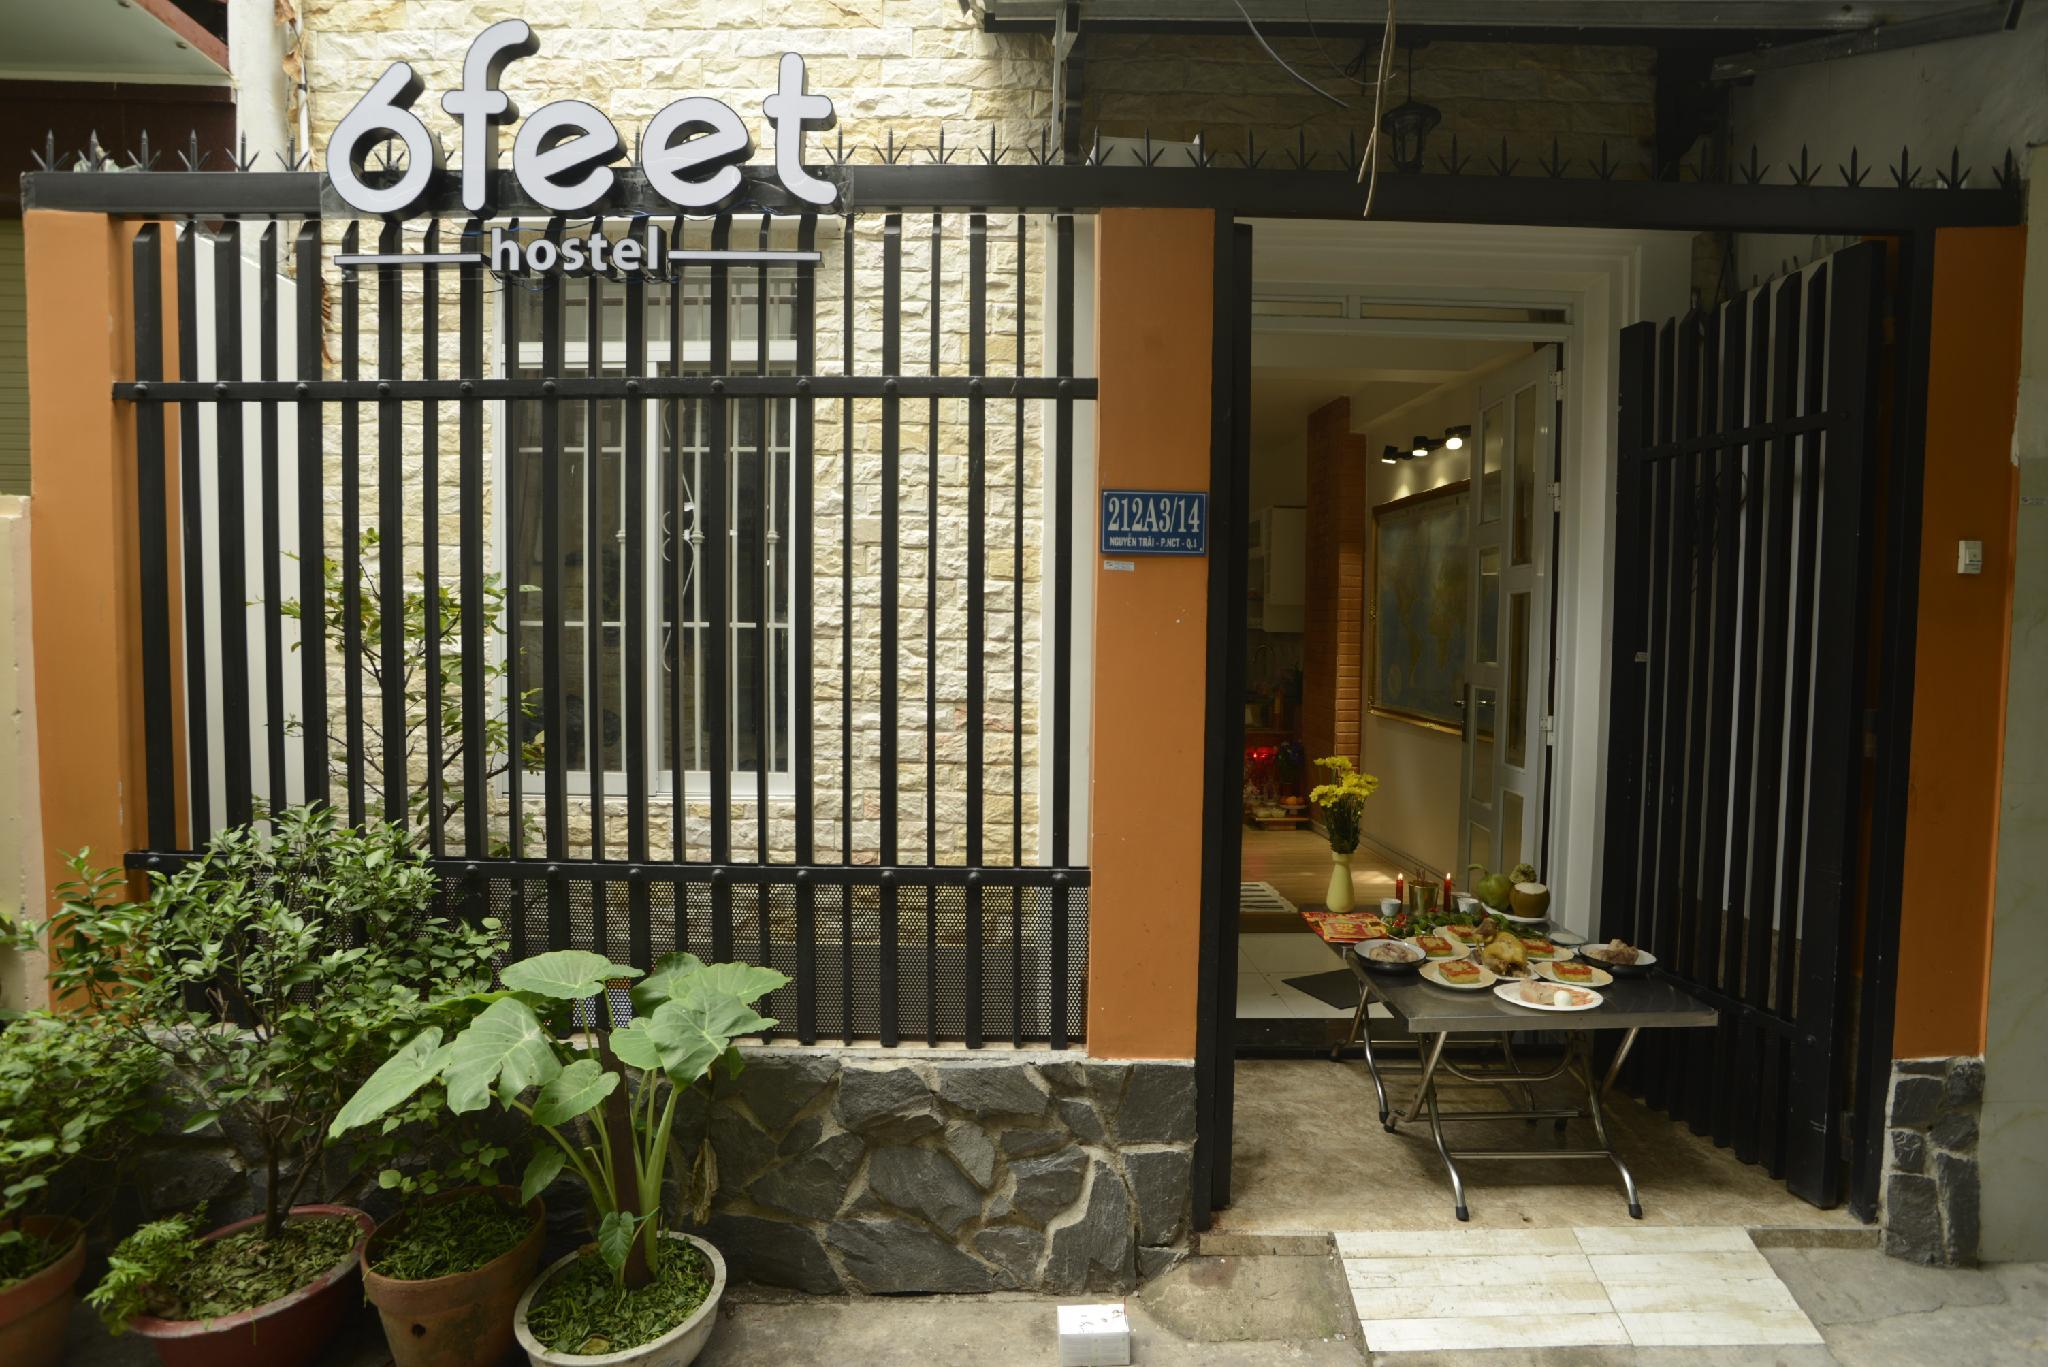 6feet Hostel